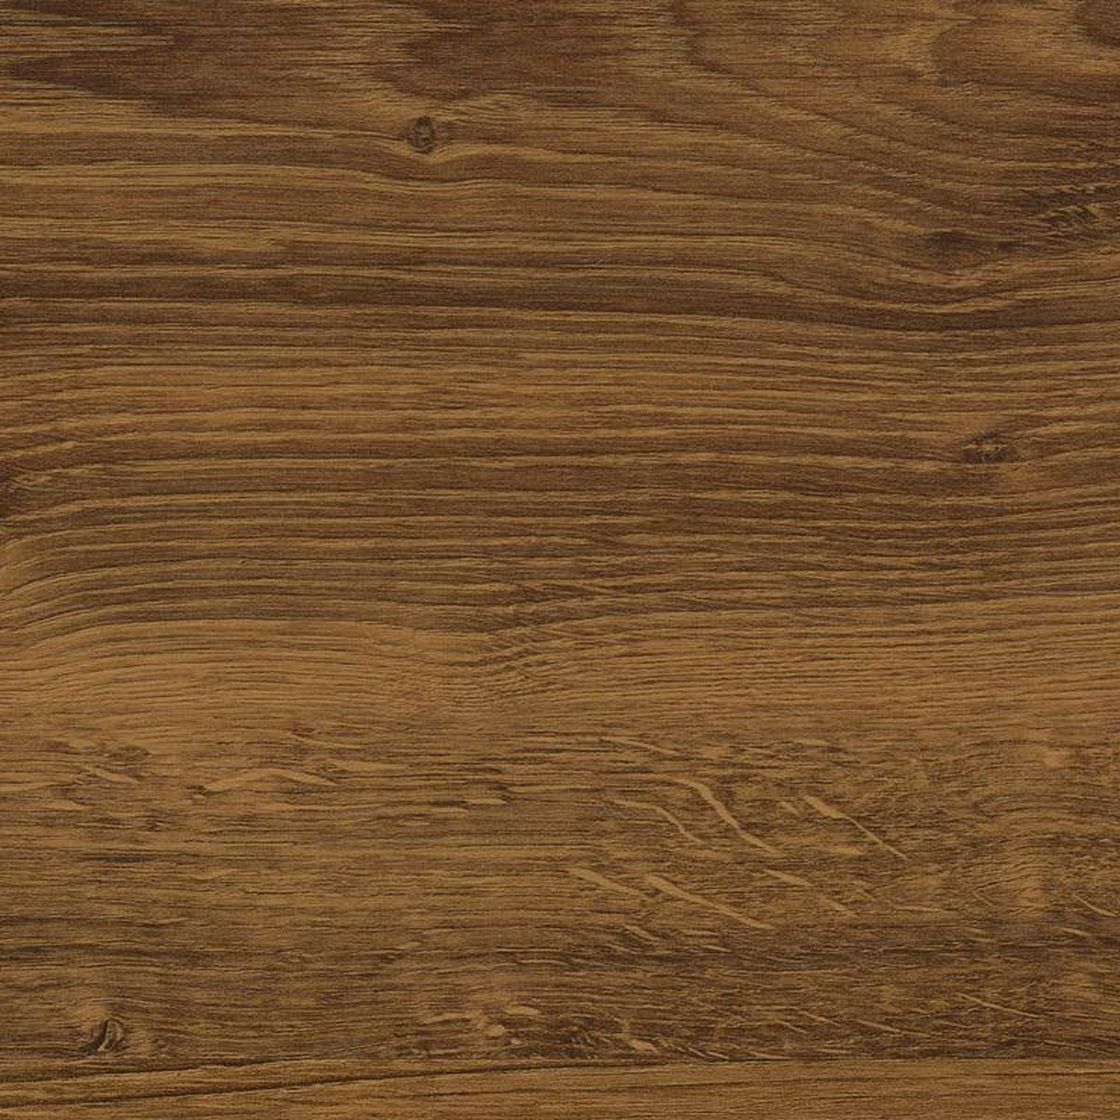 Wineo 1000 Bioboden Dacota Oak Pl017r Bio Vinylboden